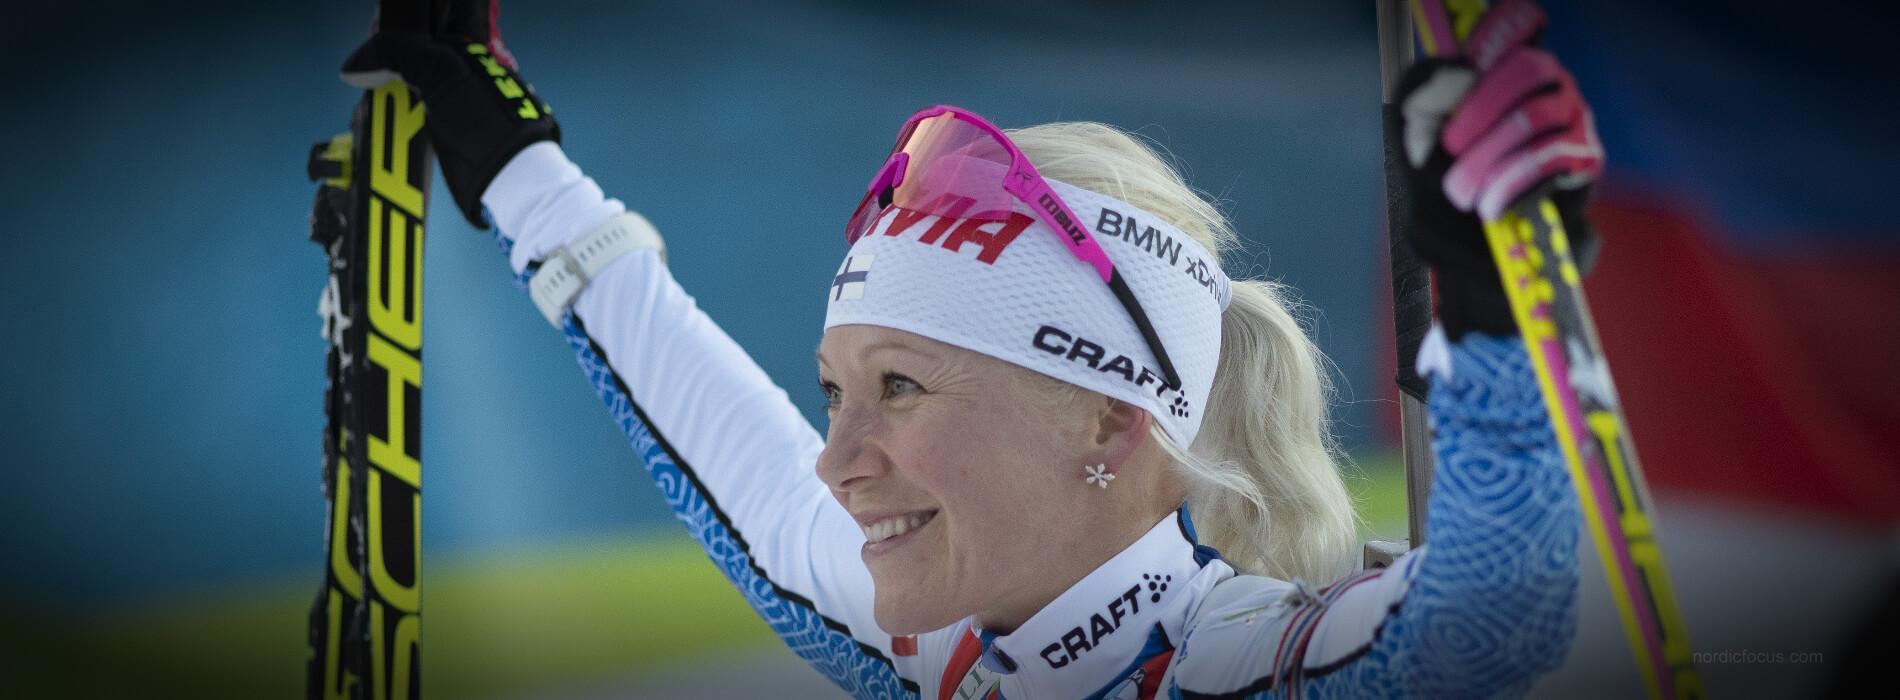 Kaisa Mäkäräinen Hochfilzen Biathlon Weltcup 2018 Verfolgung